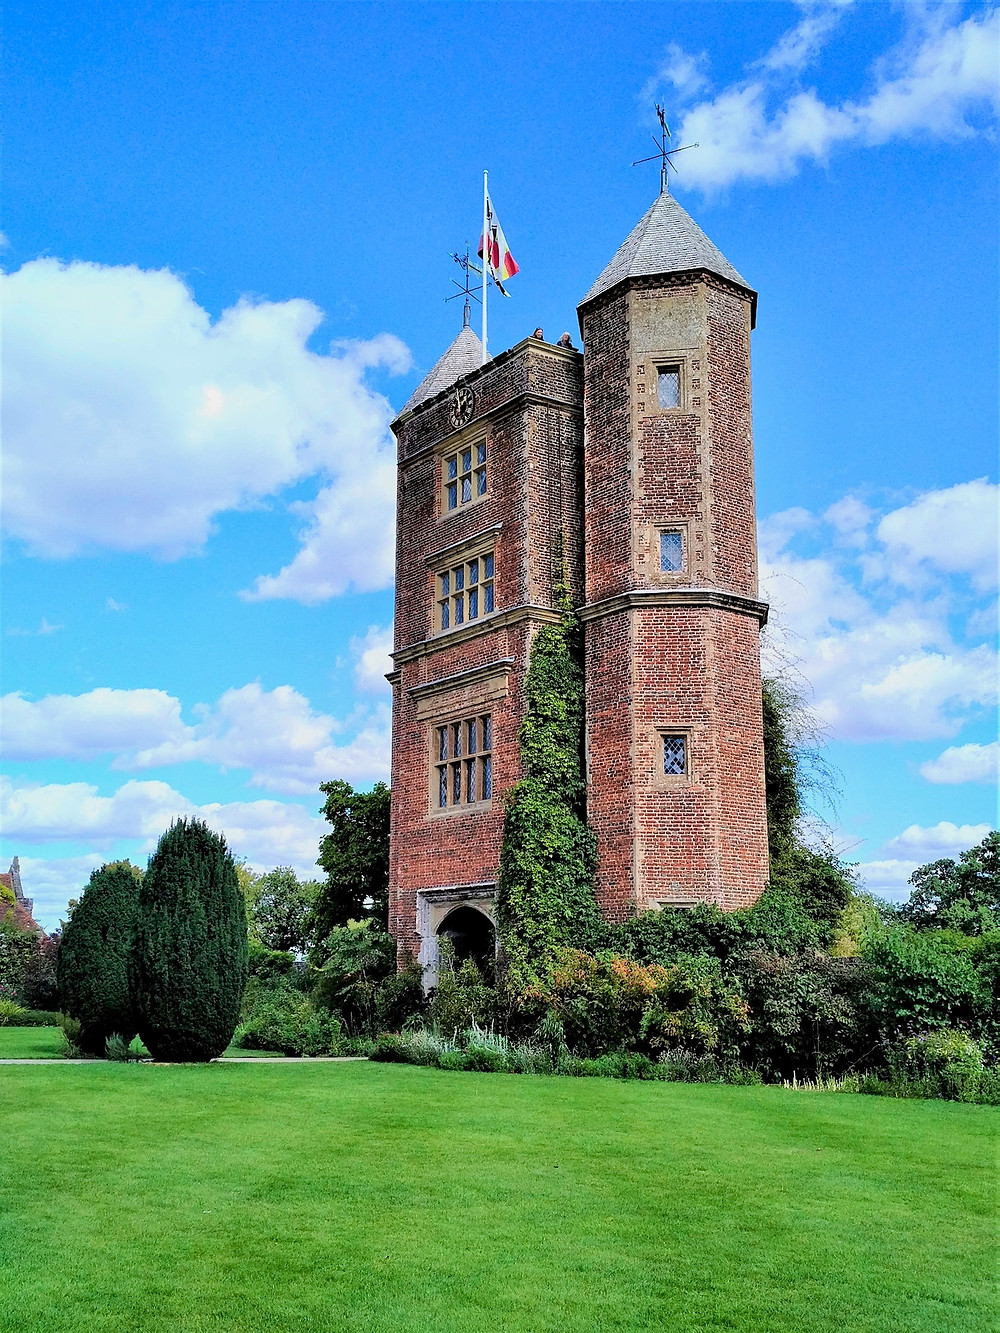 The 16th century Tower at Sissinghurst Castle